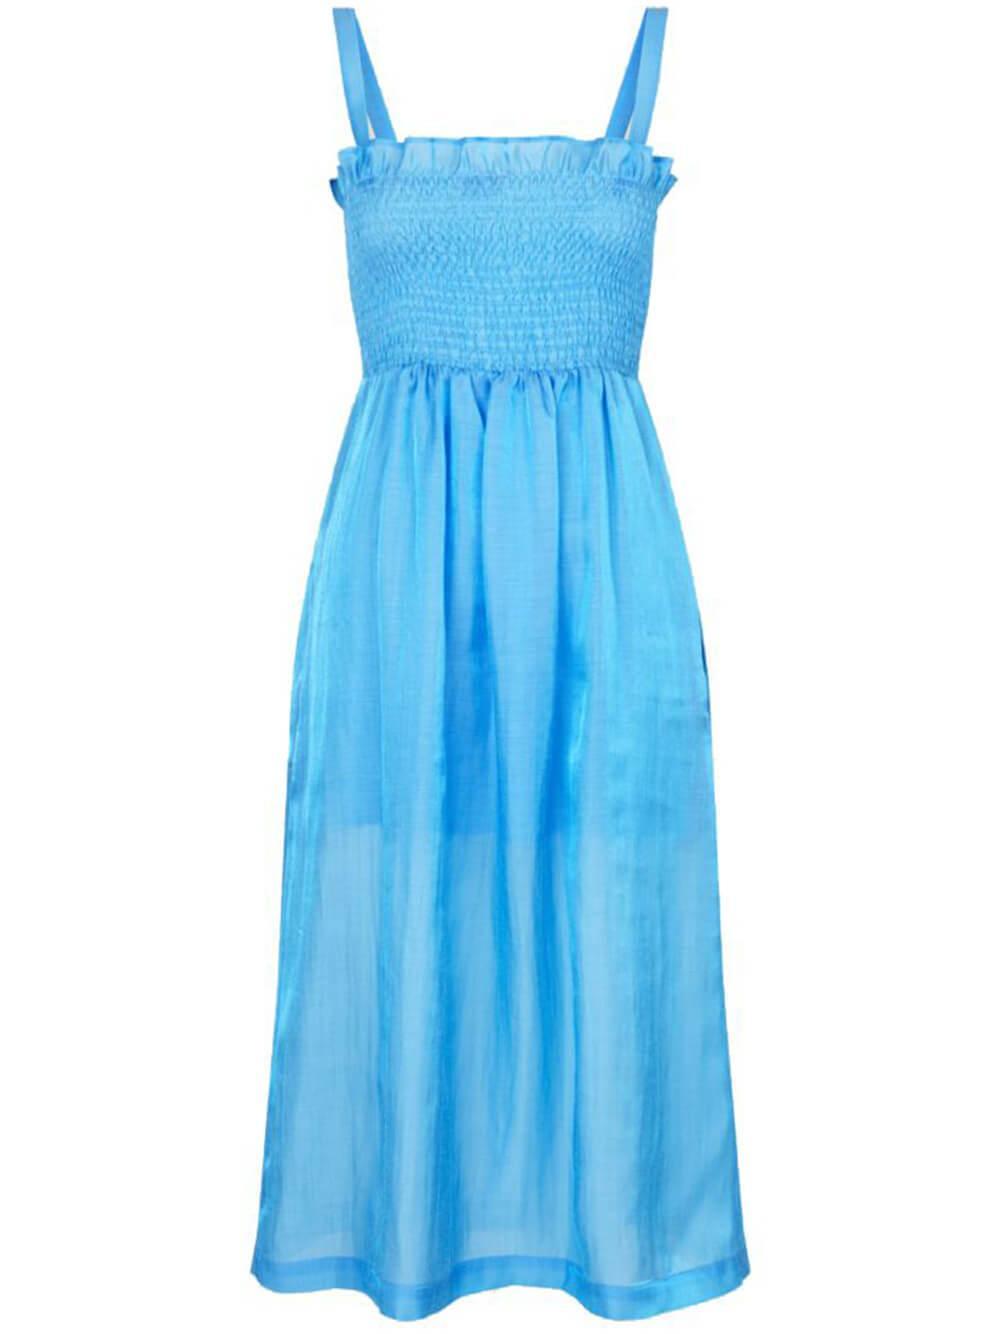 Aherra Midi Dress Item # 21592